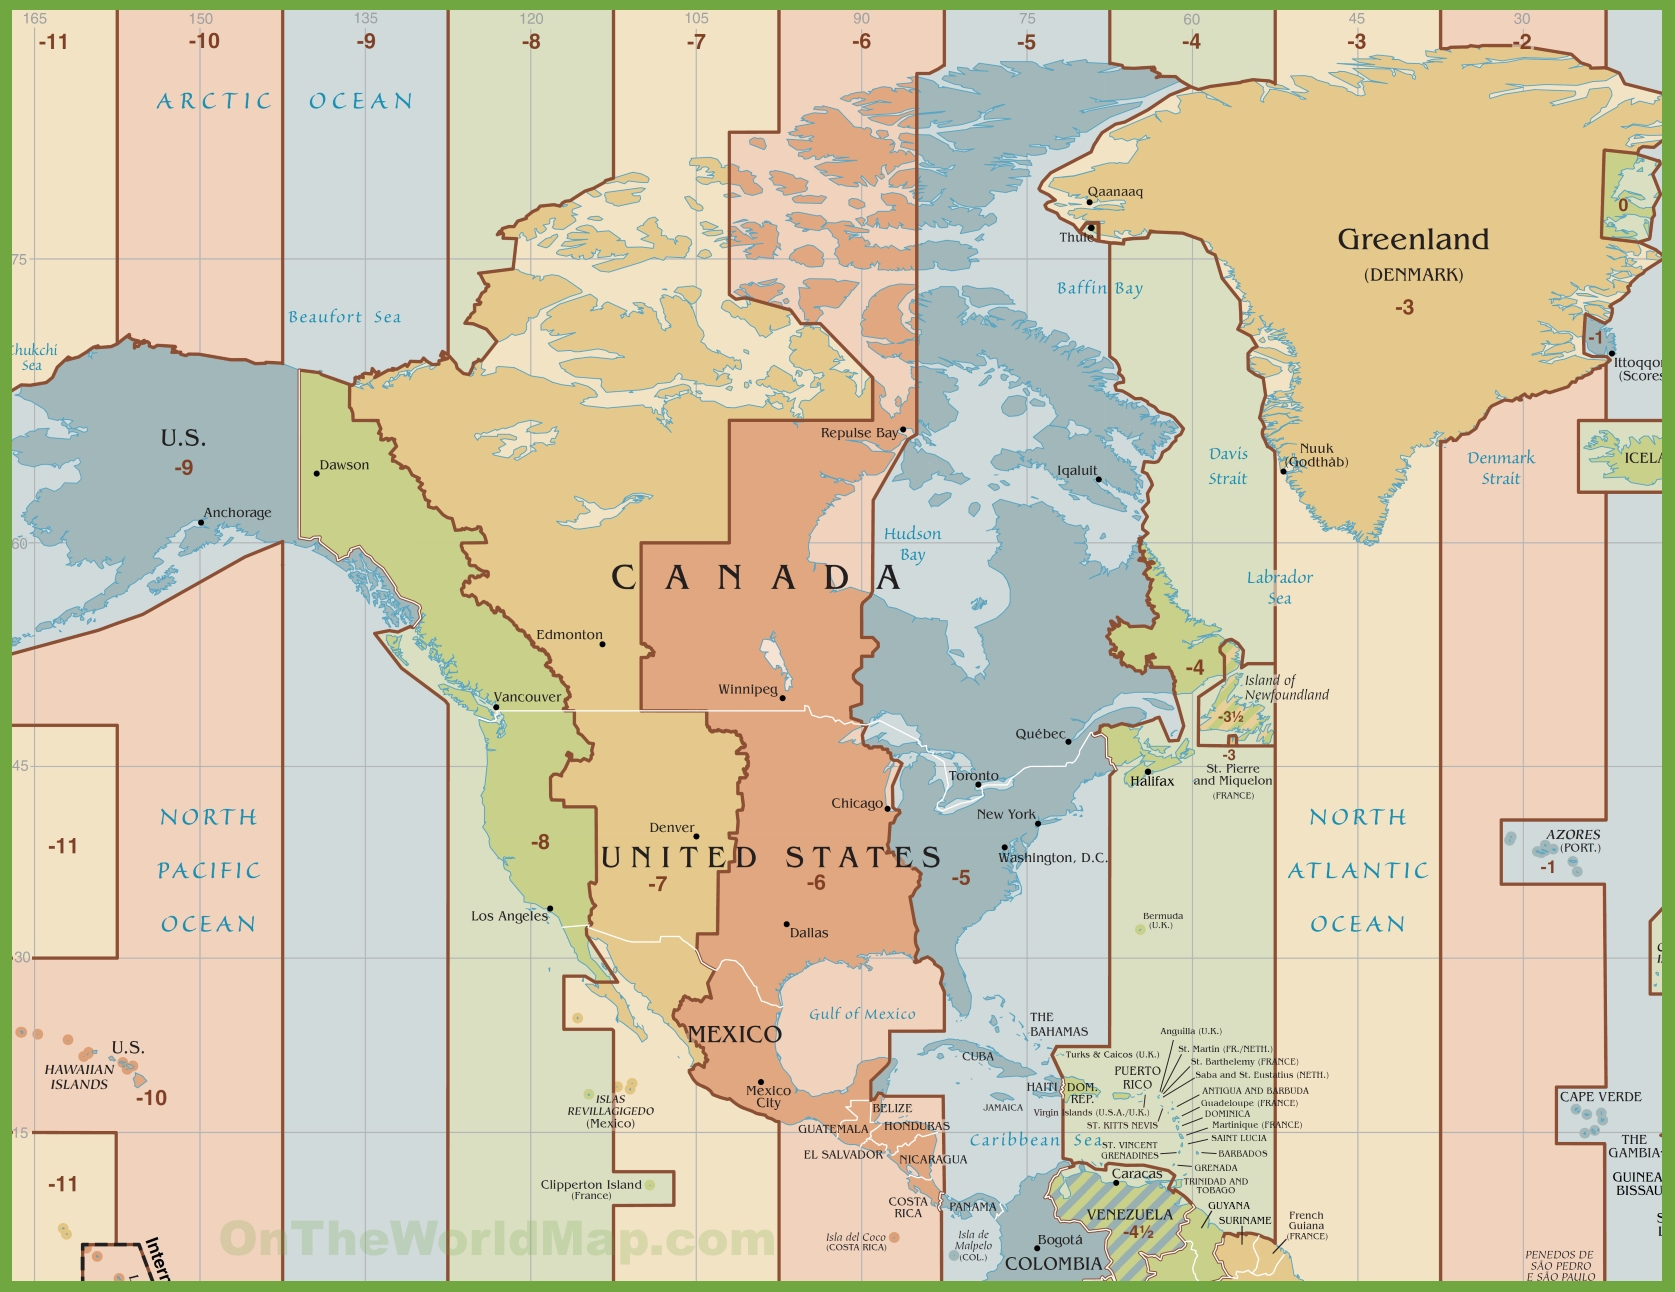 Time Zone Map North America North America time zone map Time Zone Map North America